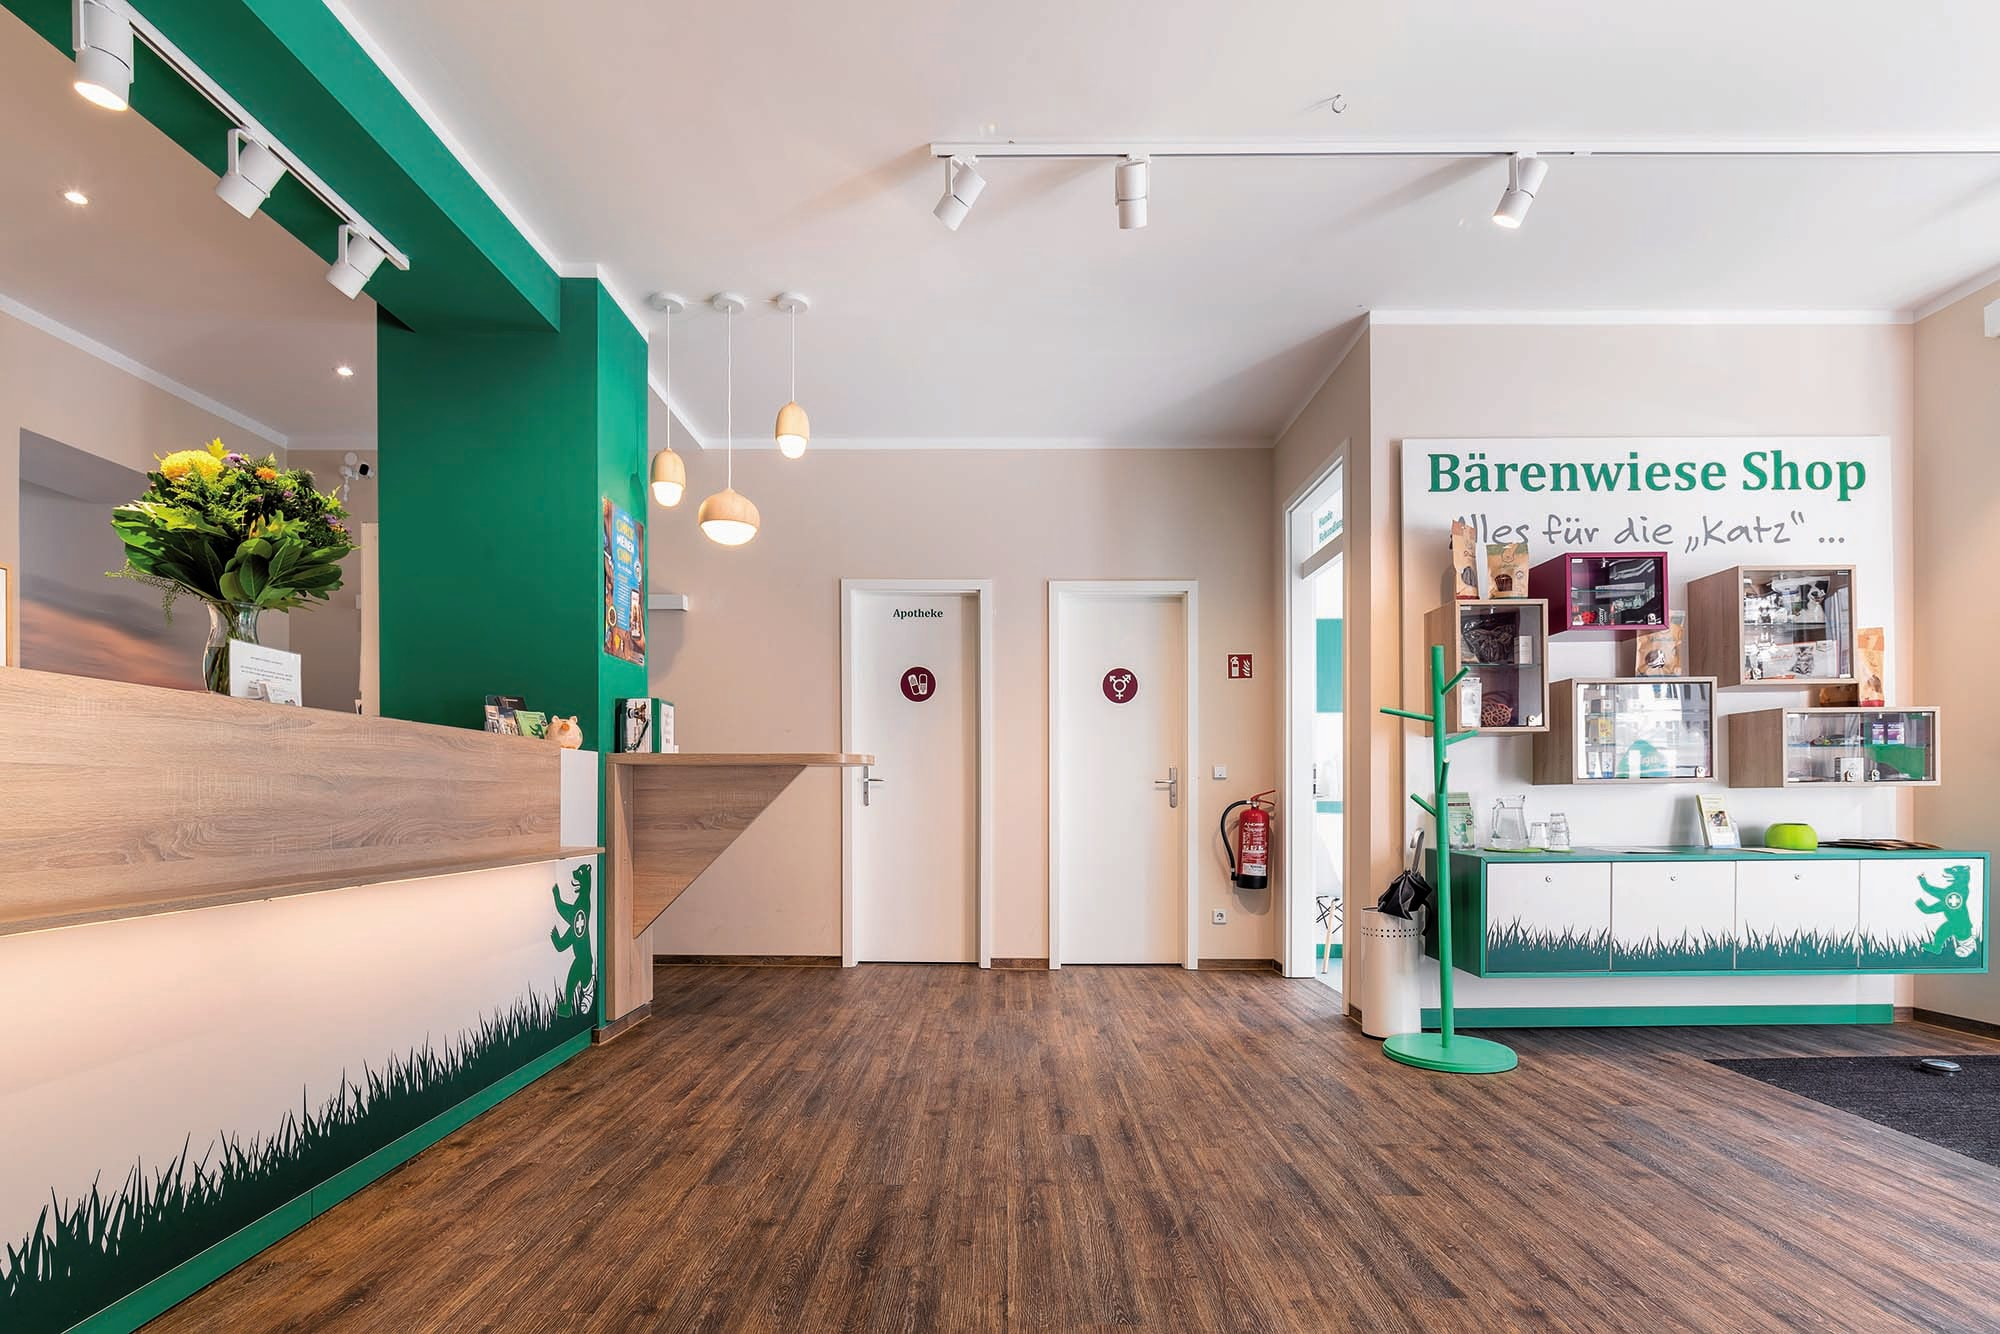 Bärenwiese Veterinary Care - Berlin - Germany